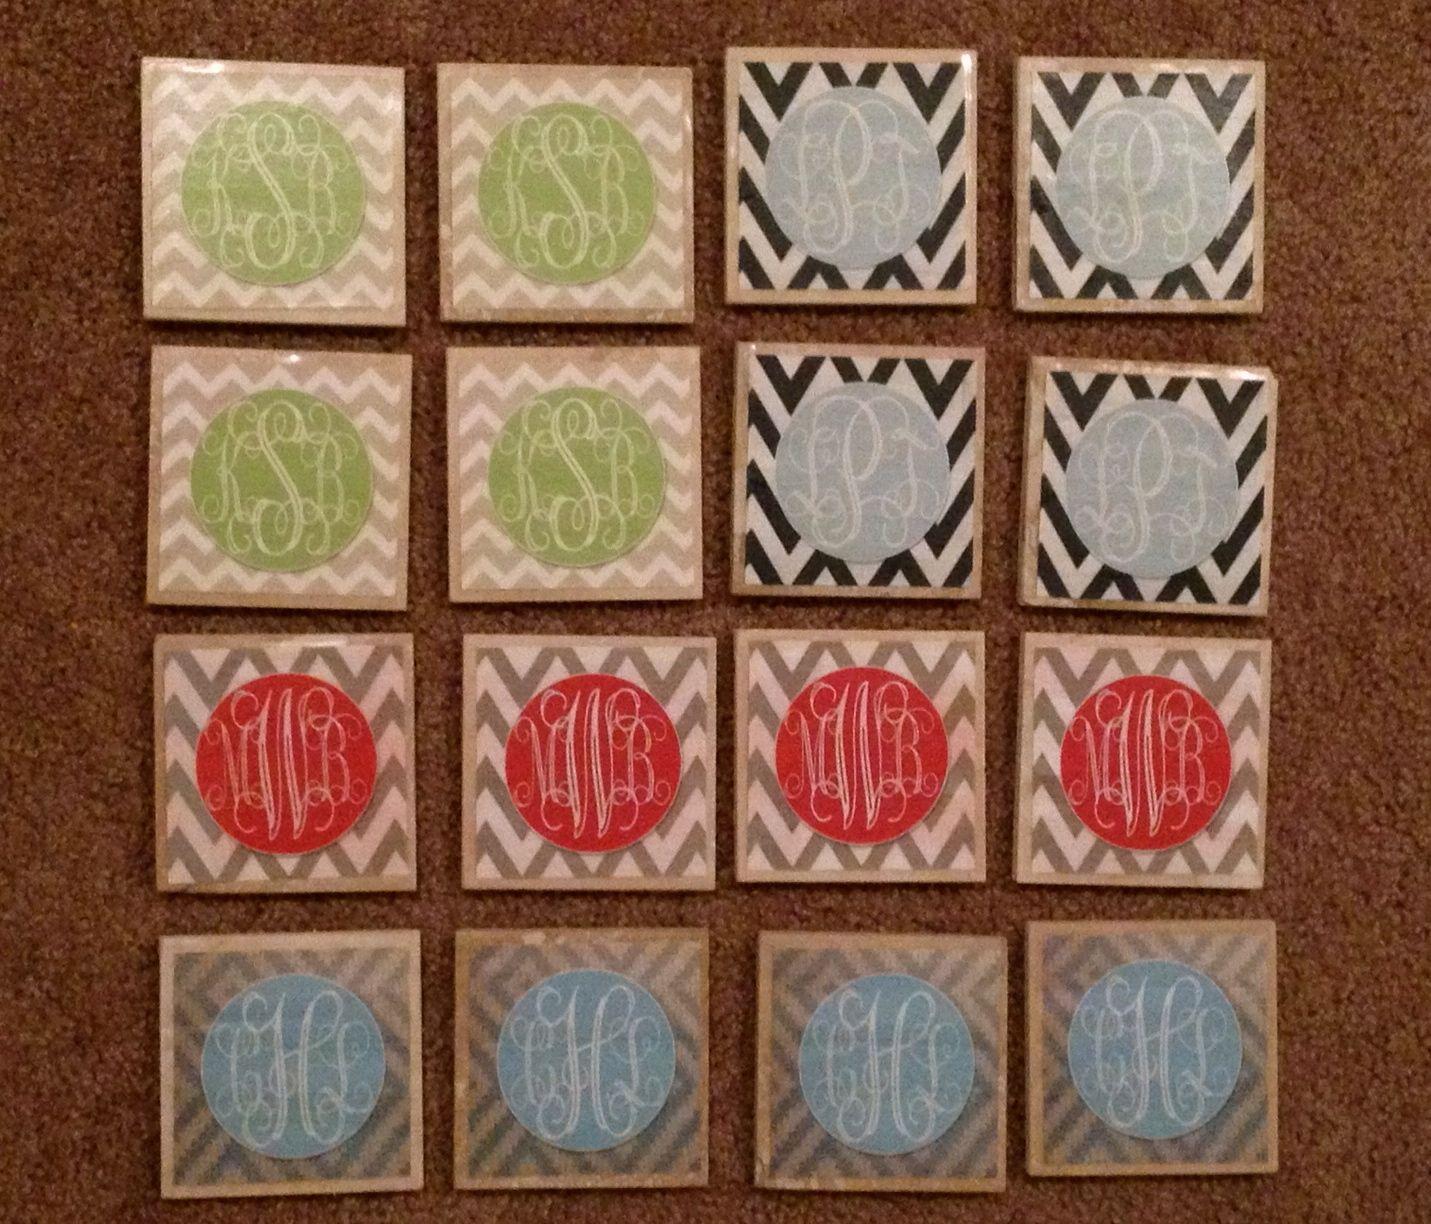 Chevron monogrammed coasters